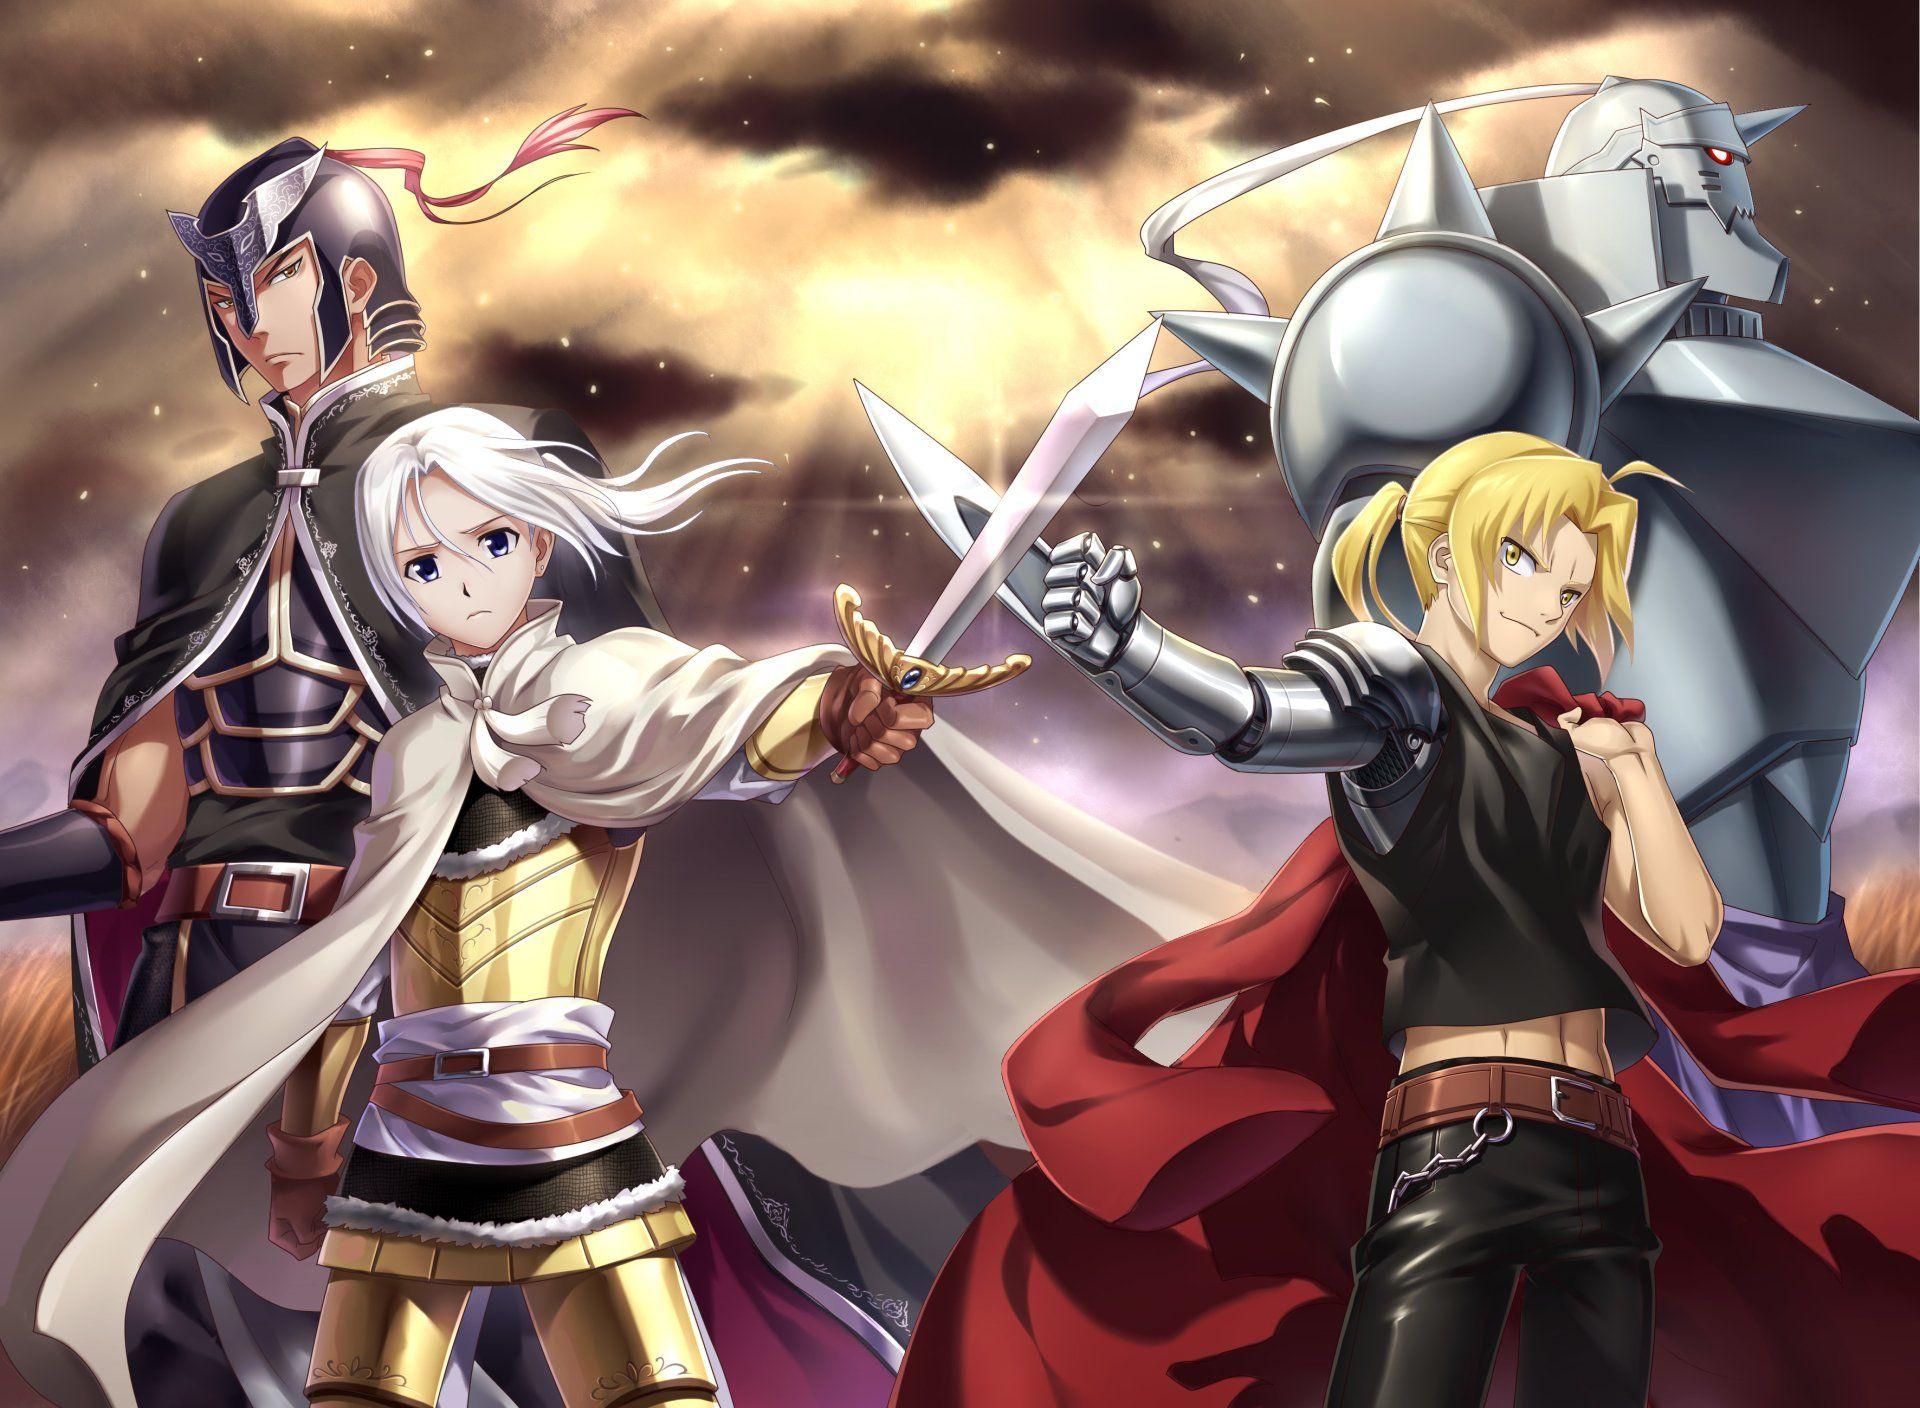 Anime crossover edward elric alphonse elric fullmetal